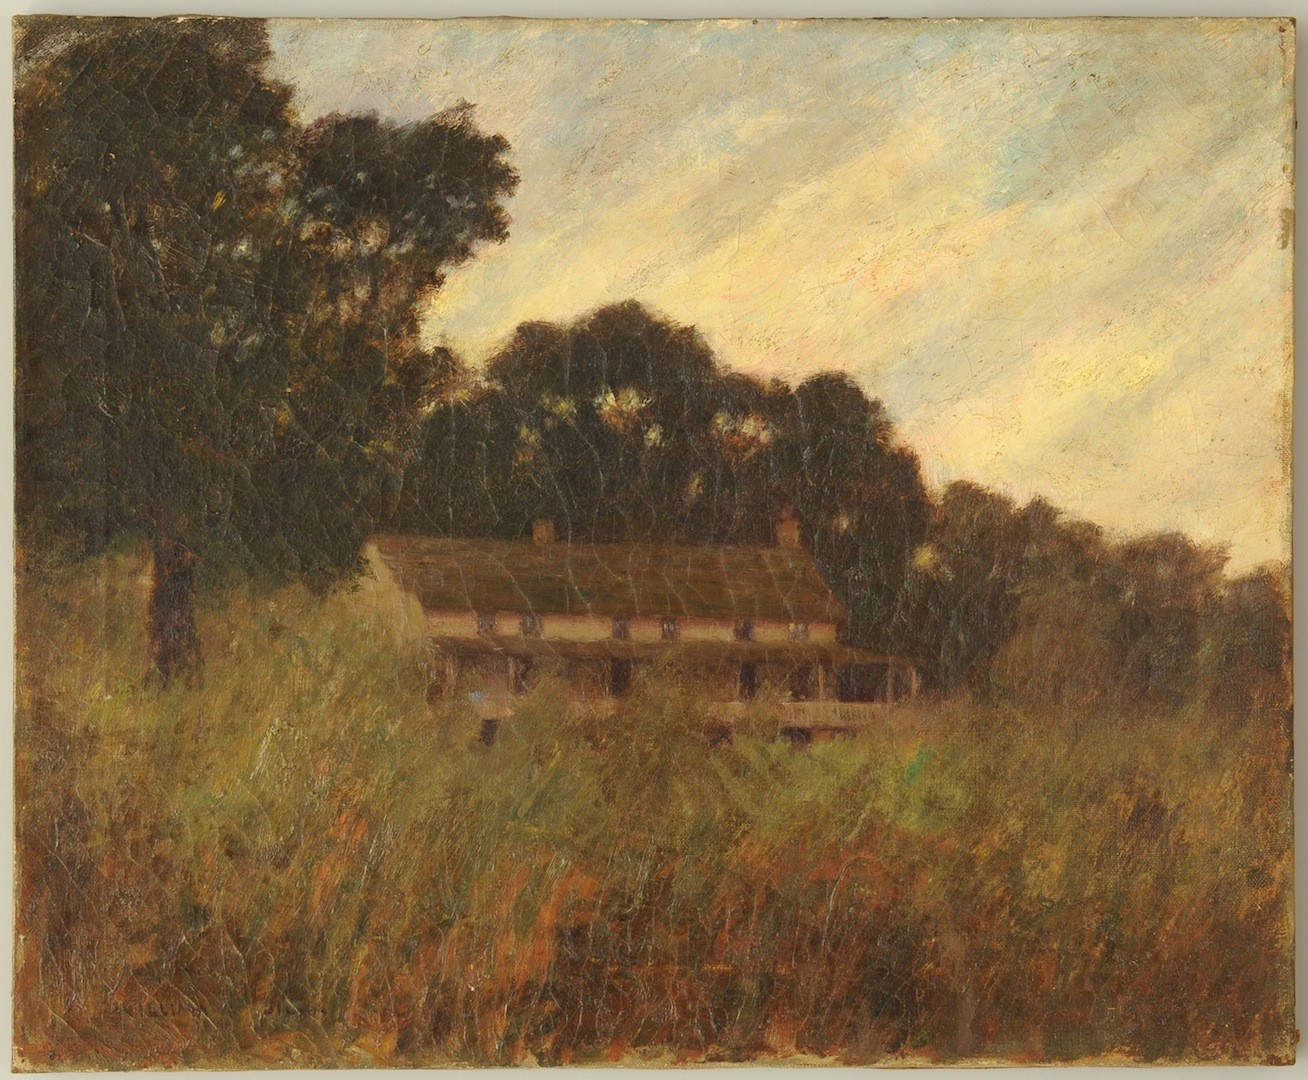 Lot __ Inv. #3034: W.P. Silva o/c, Lookout Battlefield, Cravens House